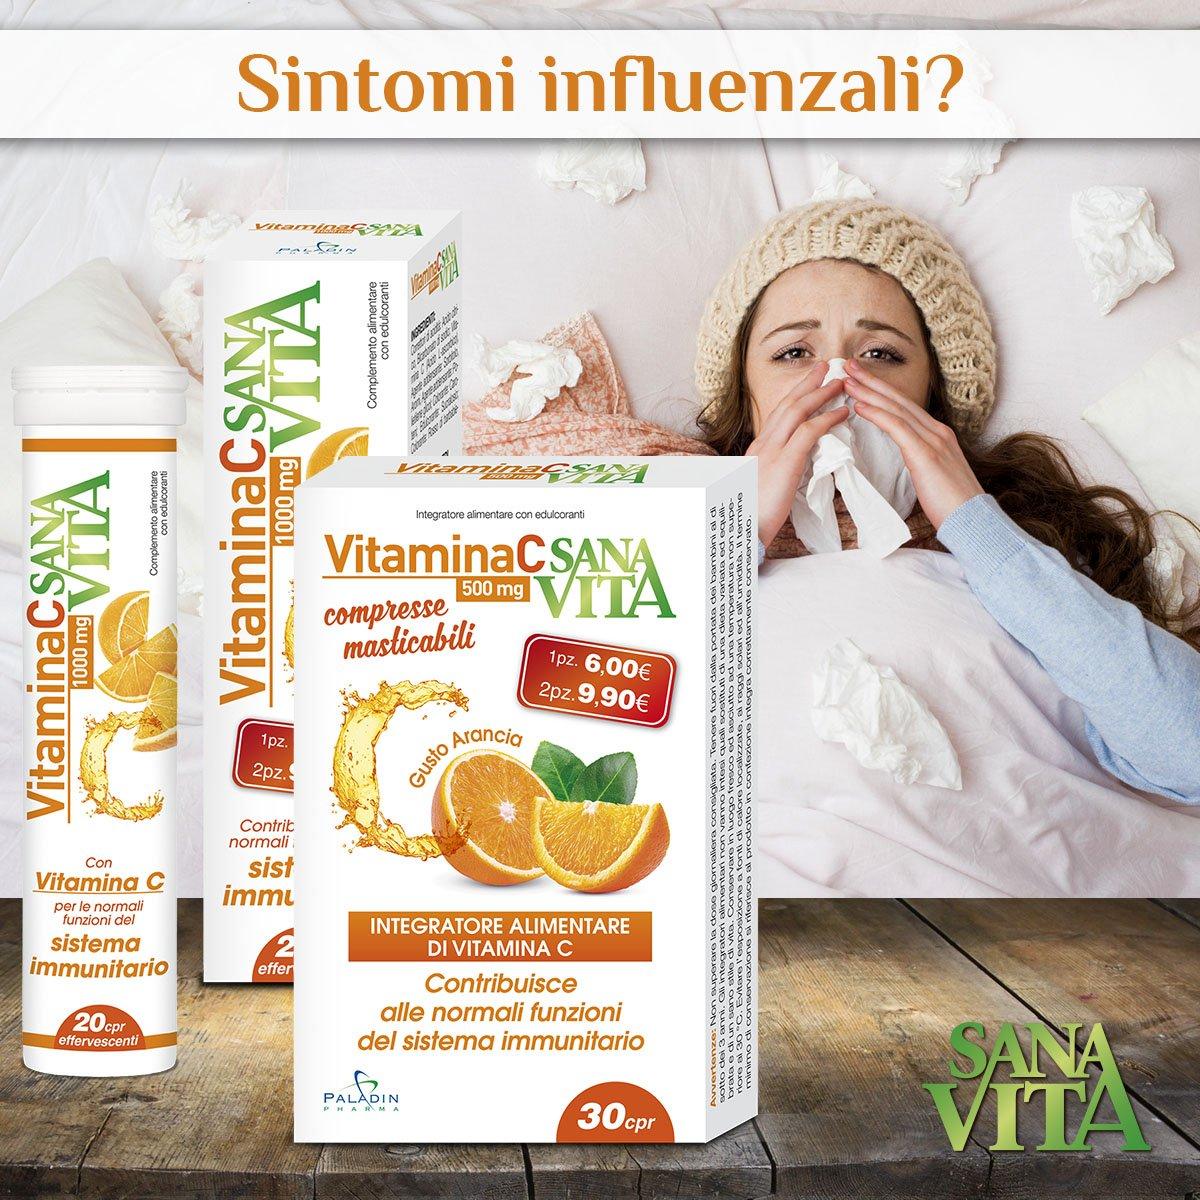 Vitamina c e difese immunitarie